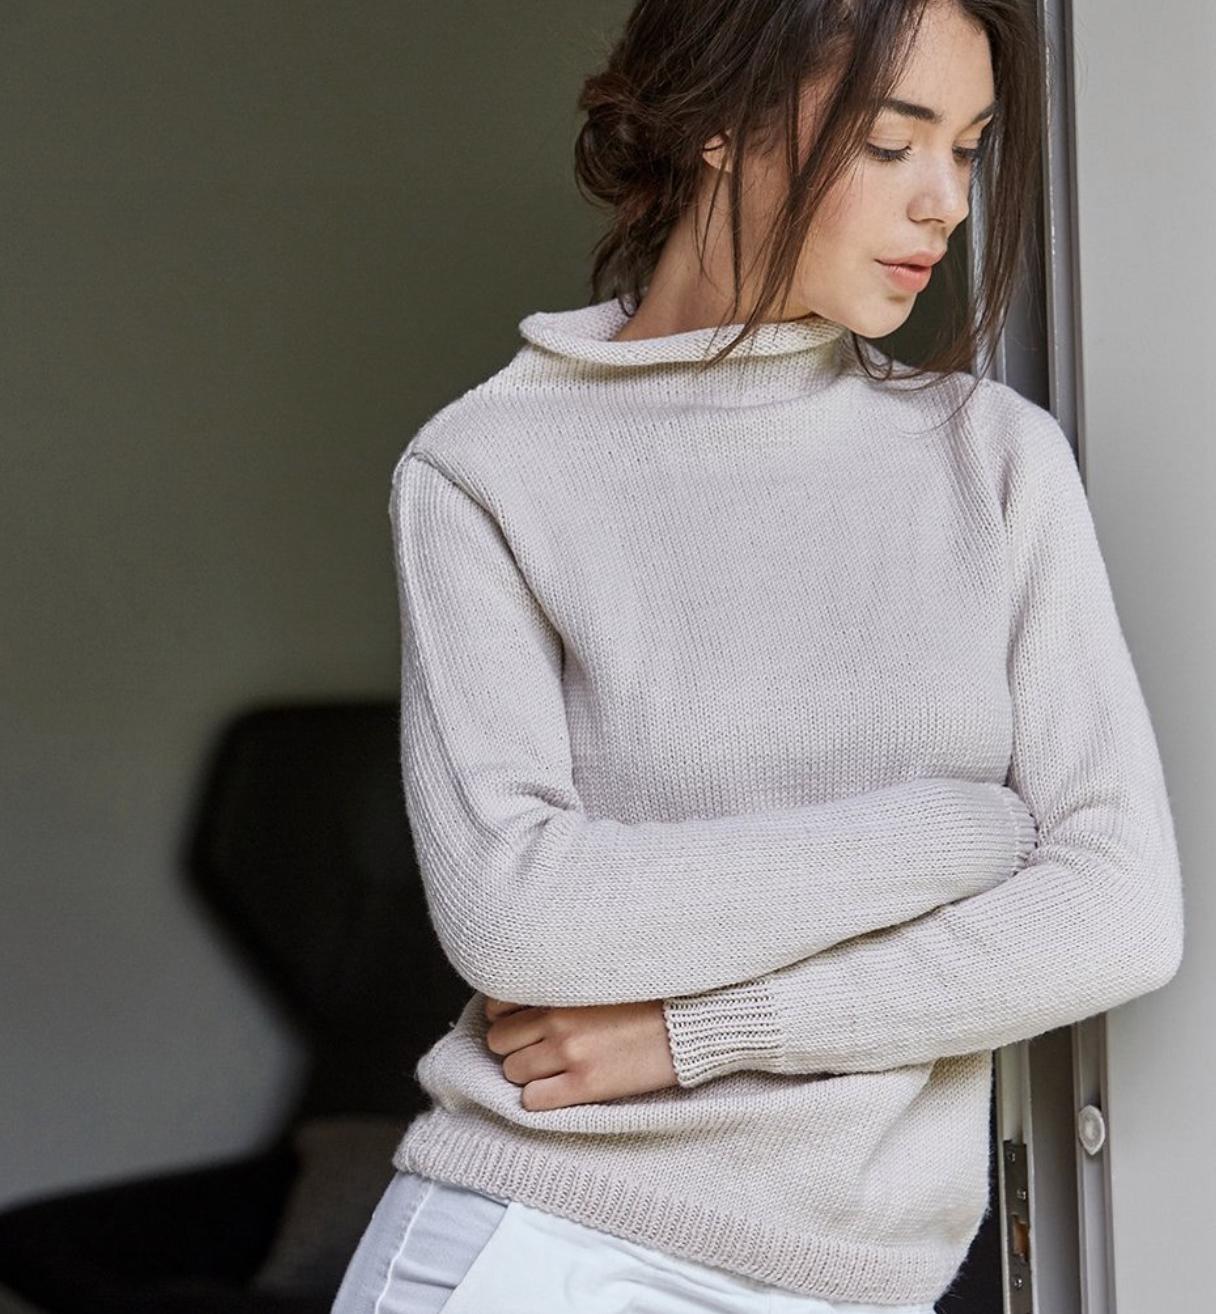 Bellissimo - DORA 692 - Sweater Pattern